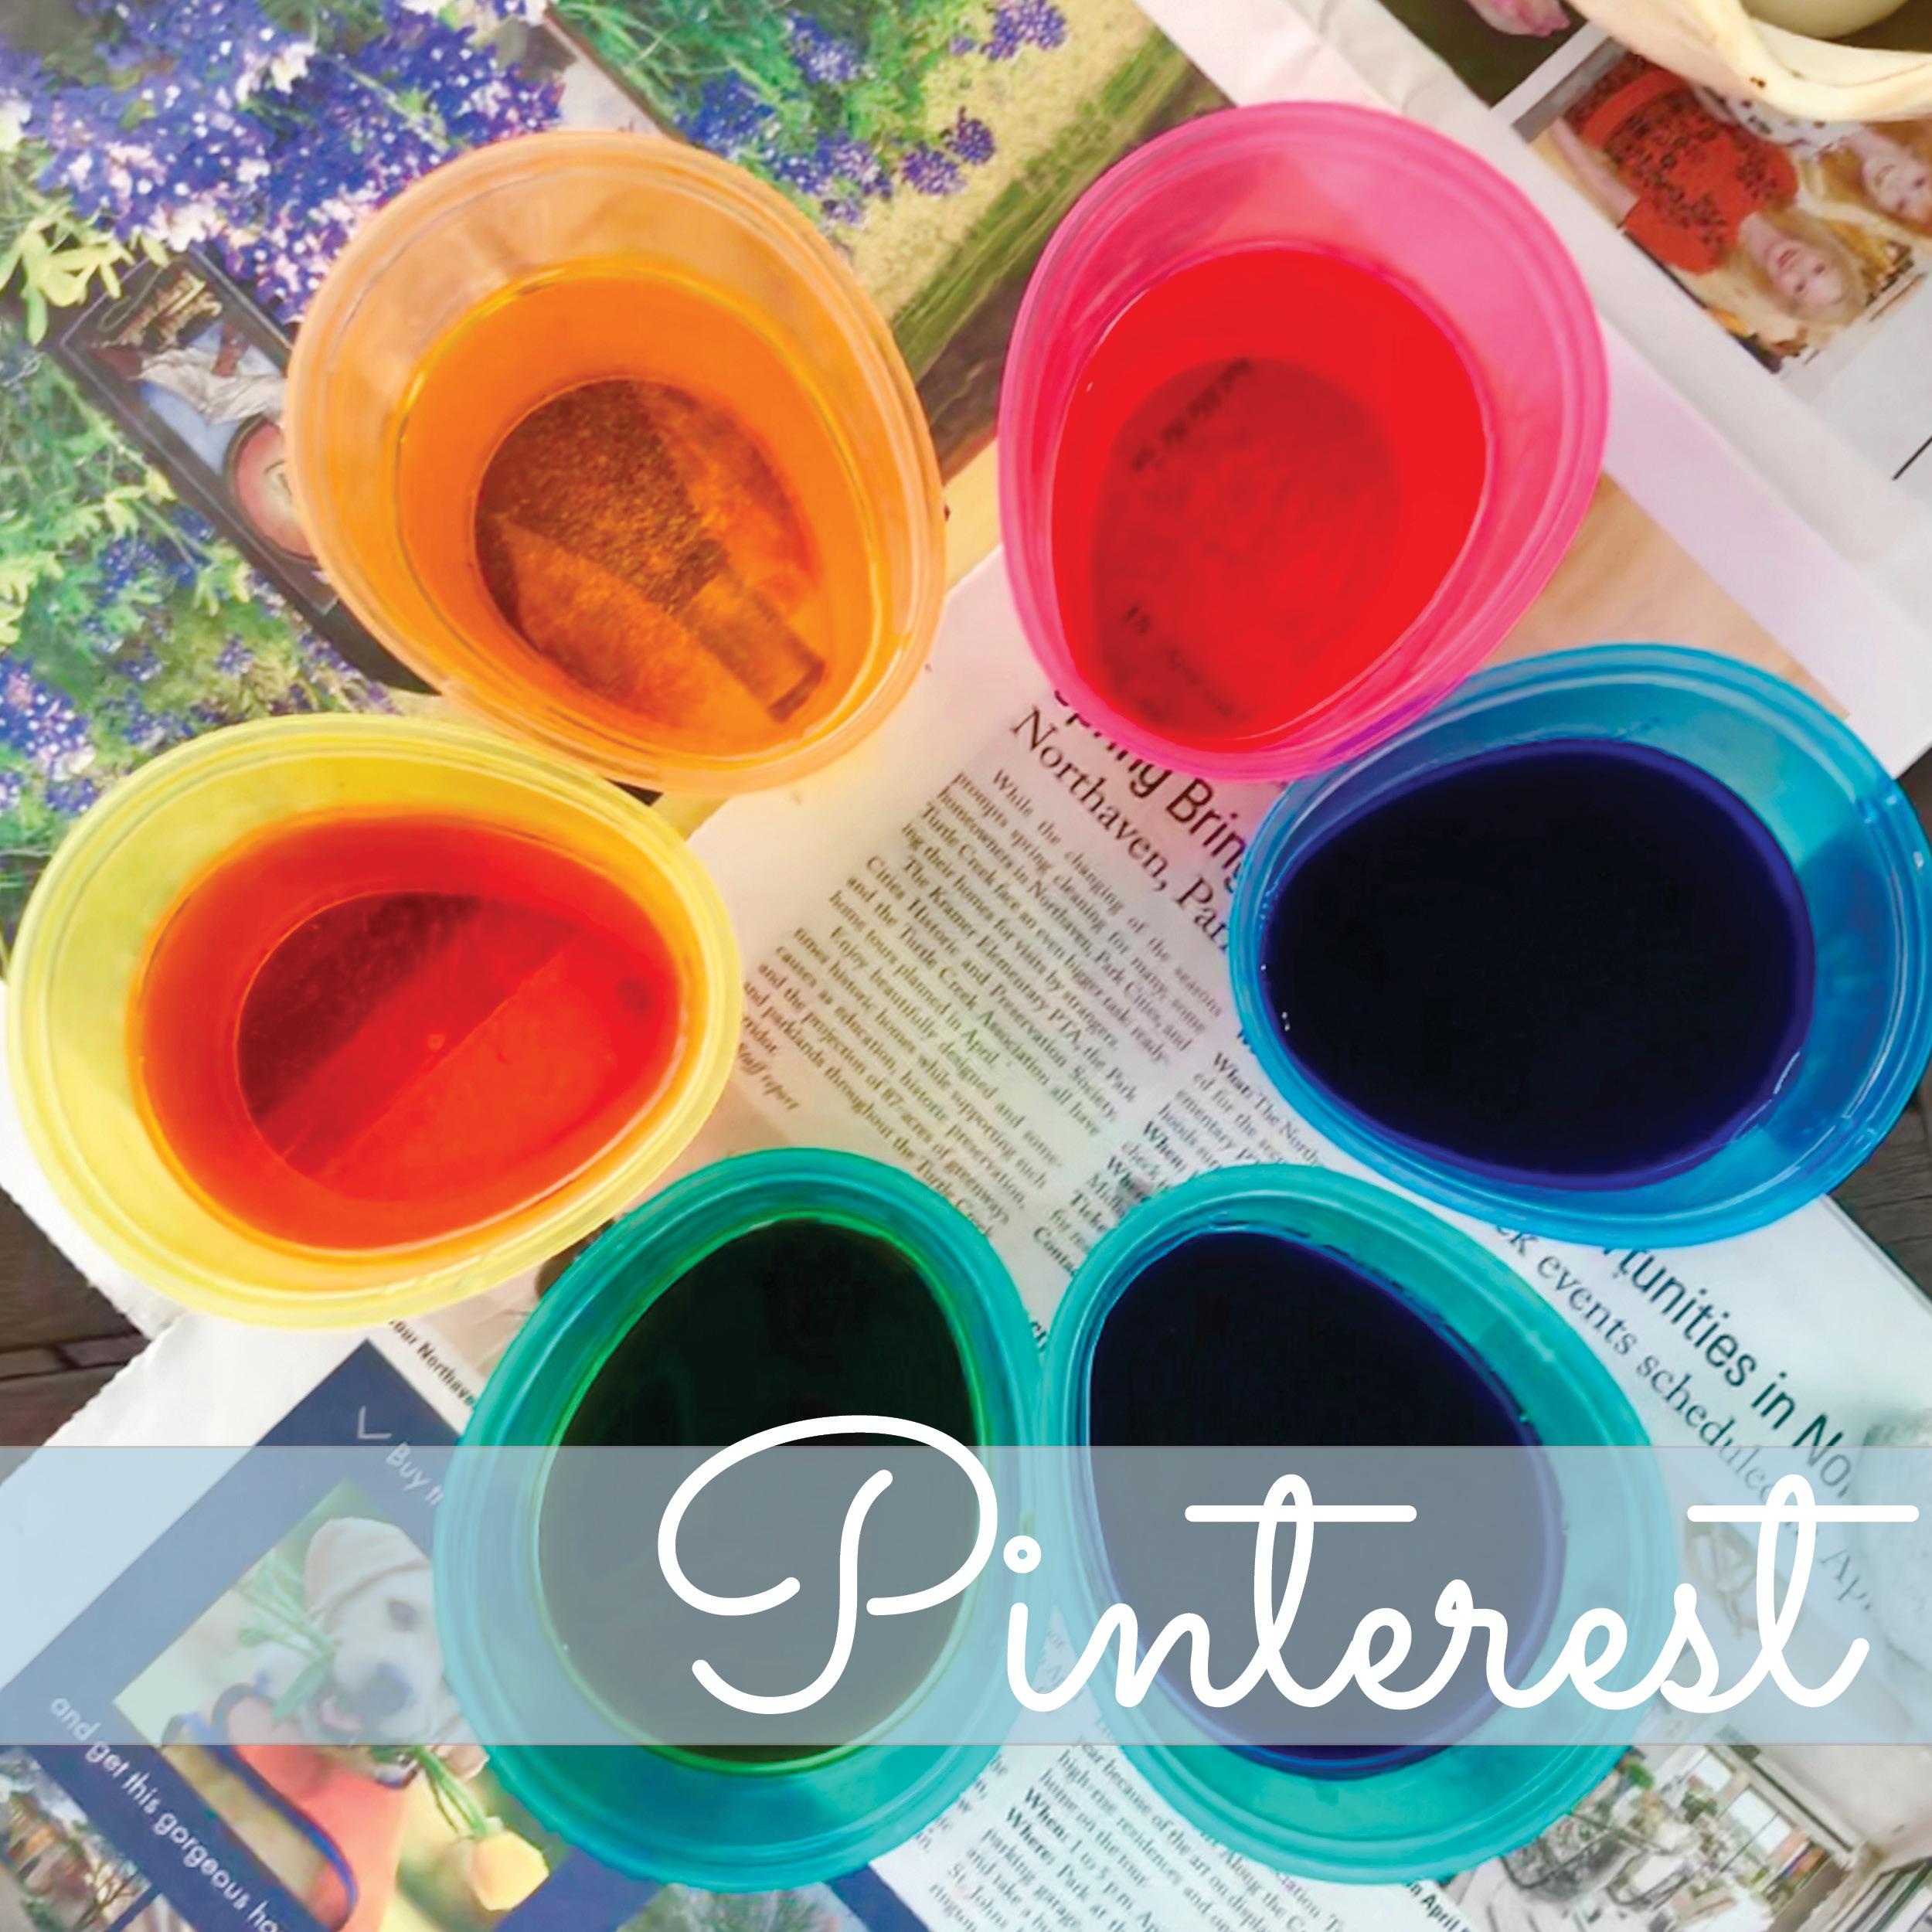 Journaling Pinterest Board - Click here!